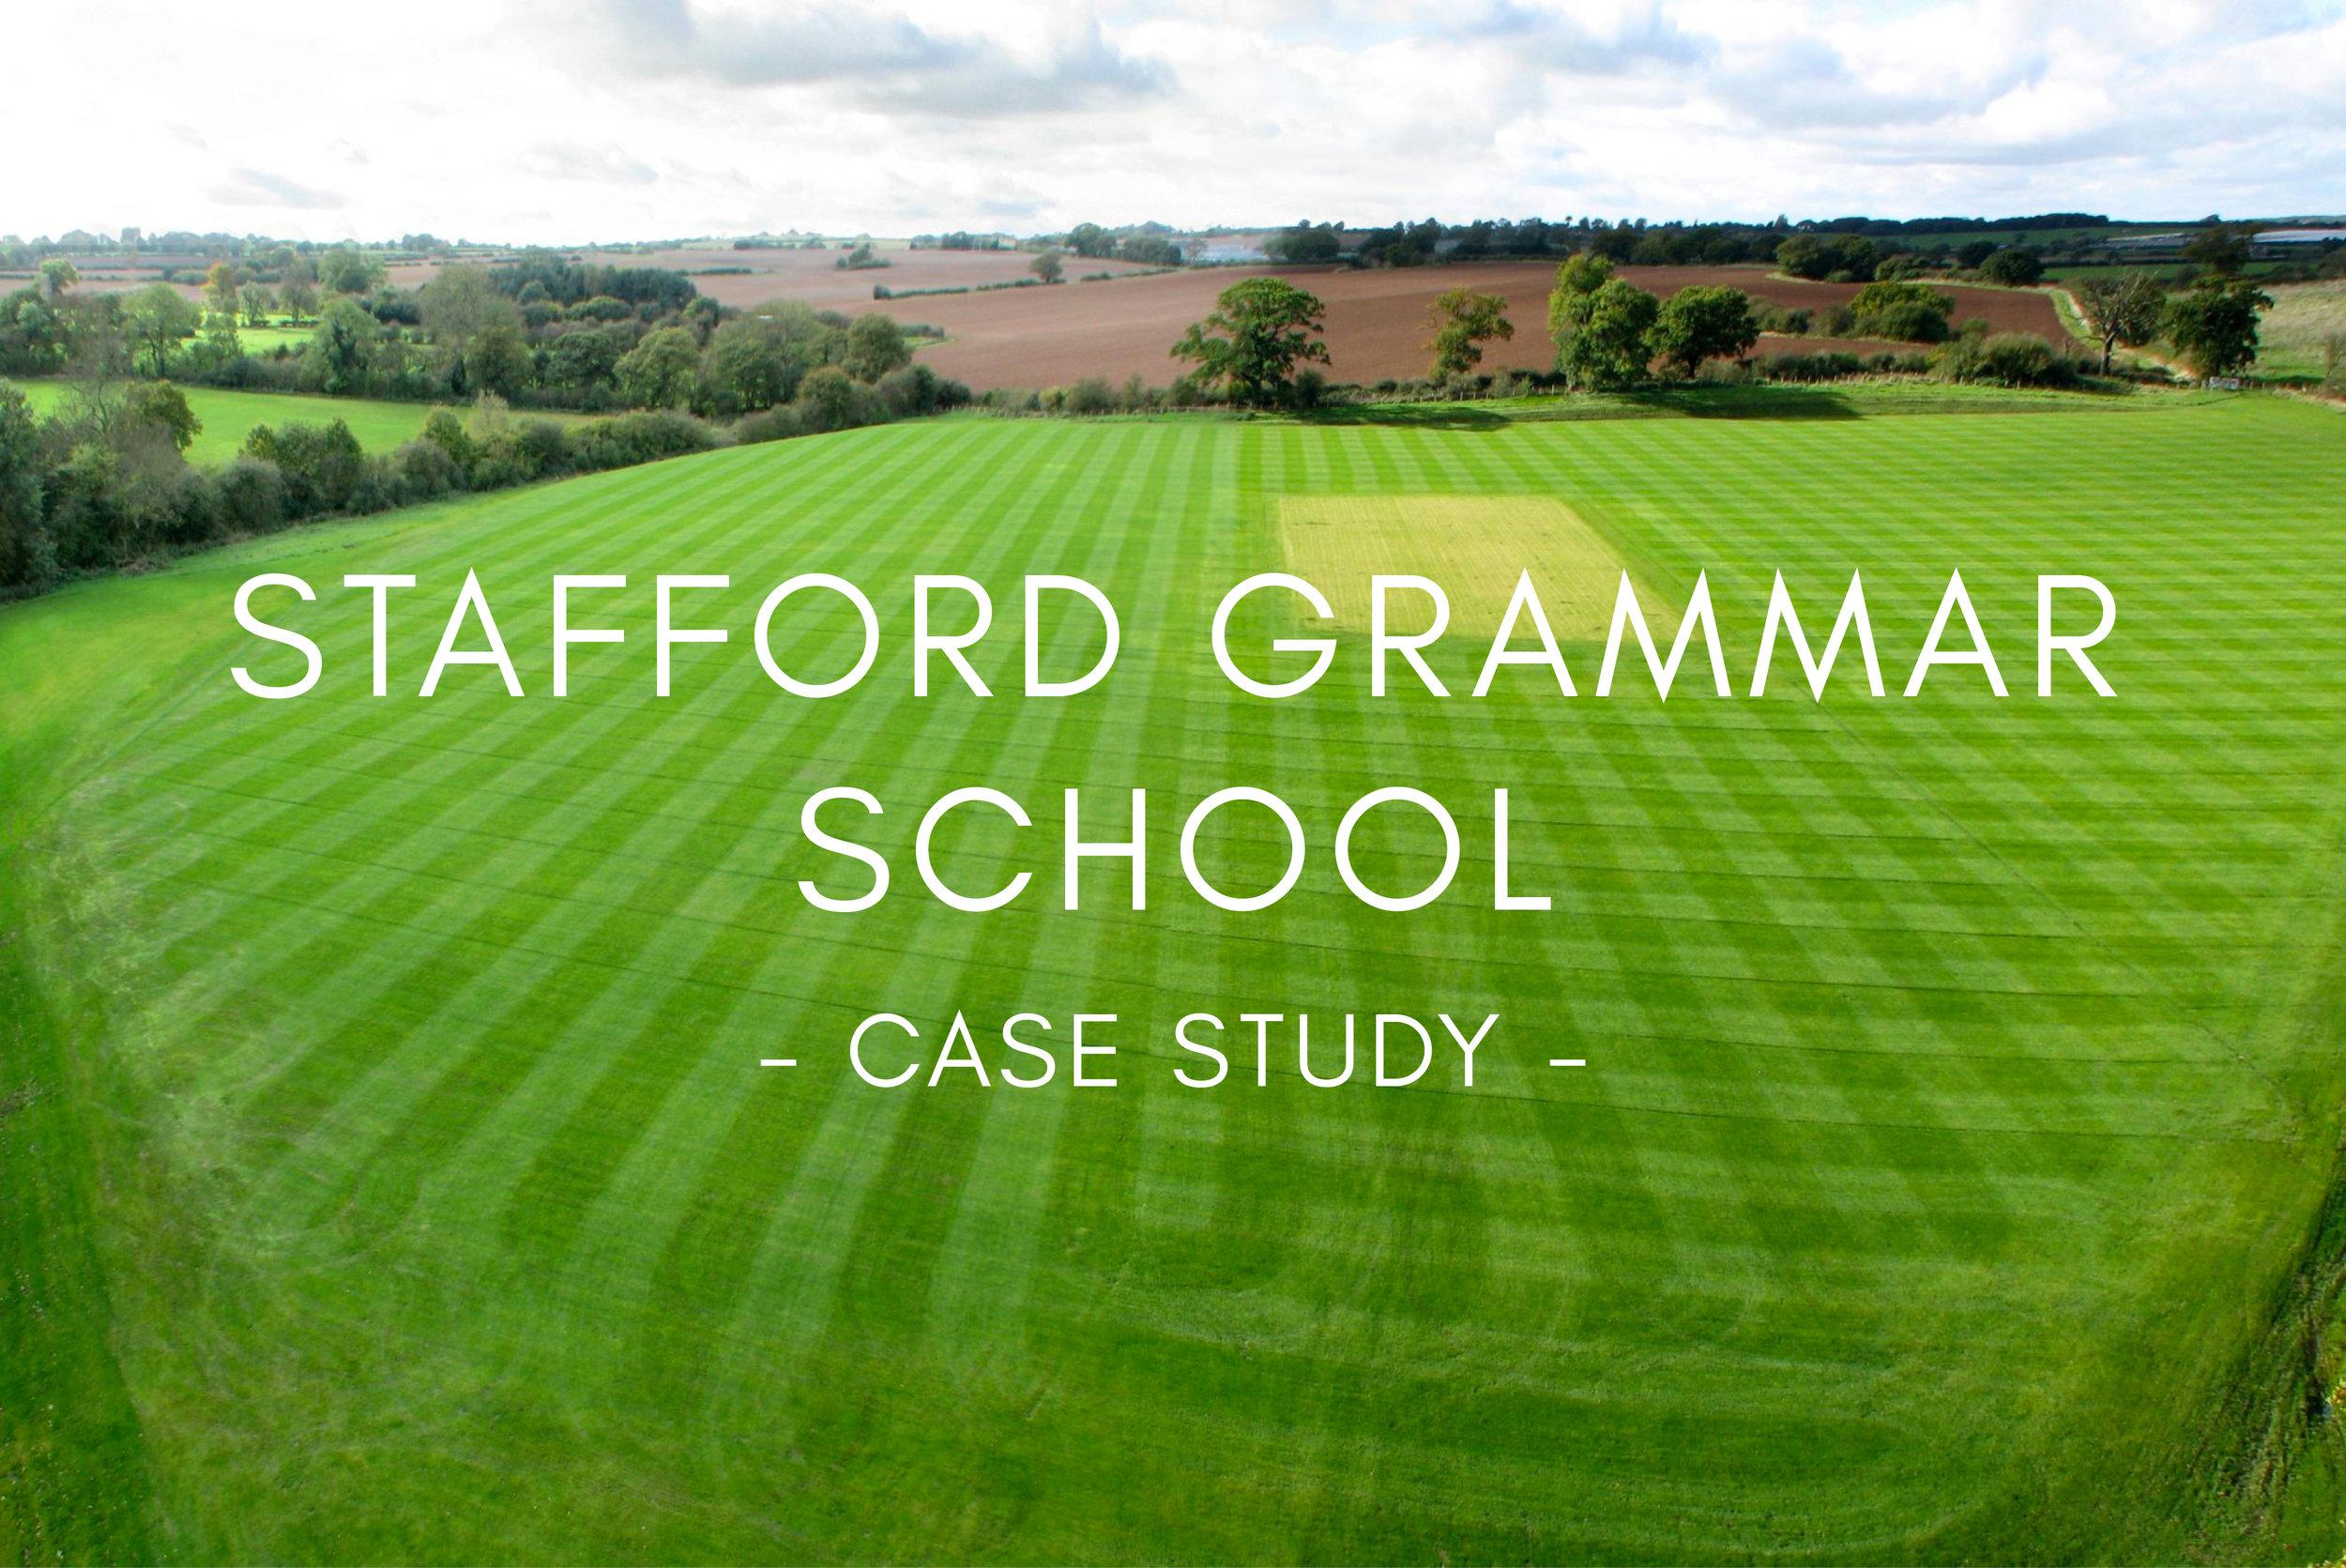 Portfolio - Stafford Grammar School Sports Pitch Design & Construction